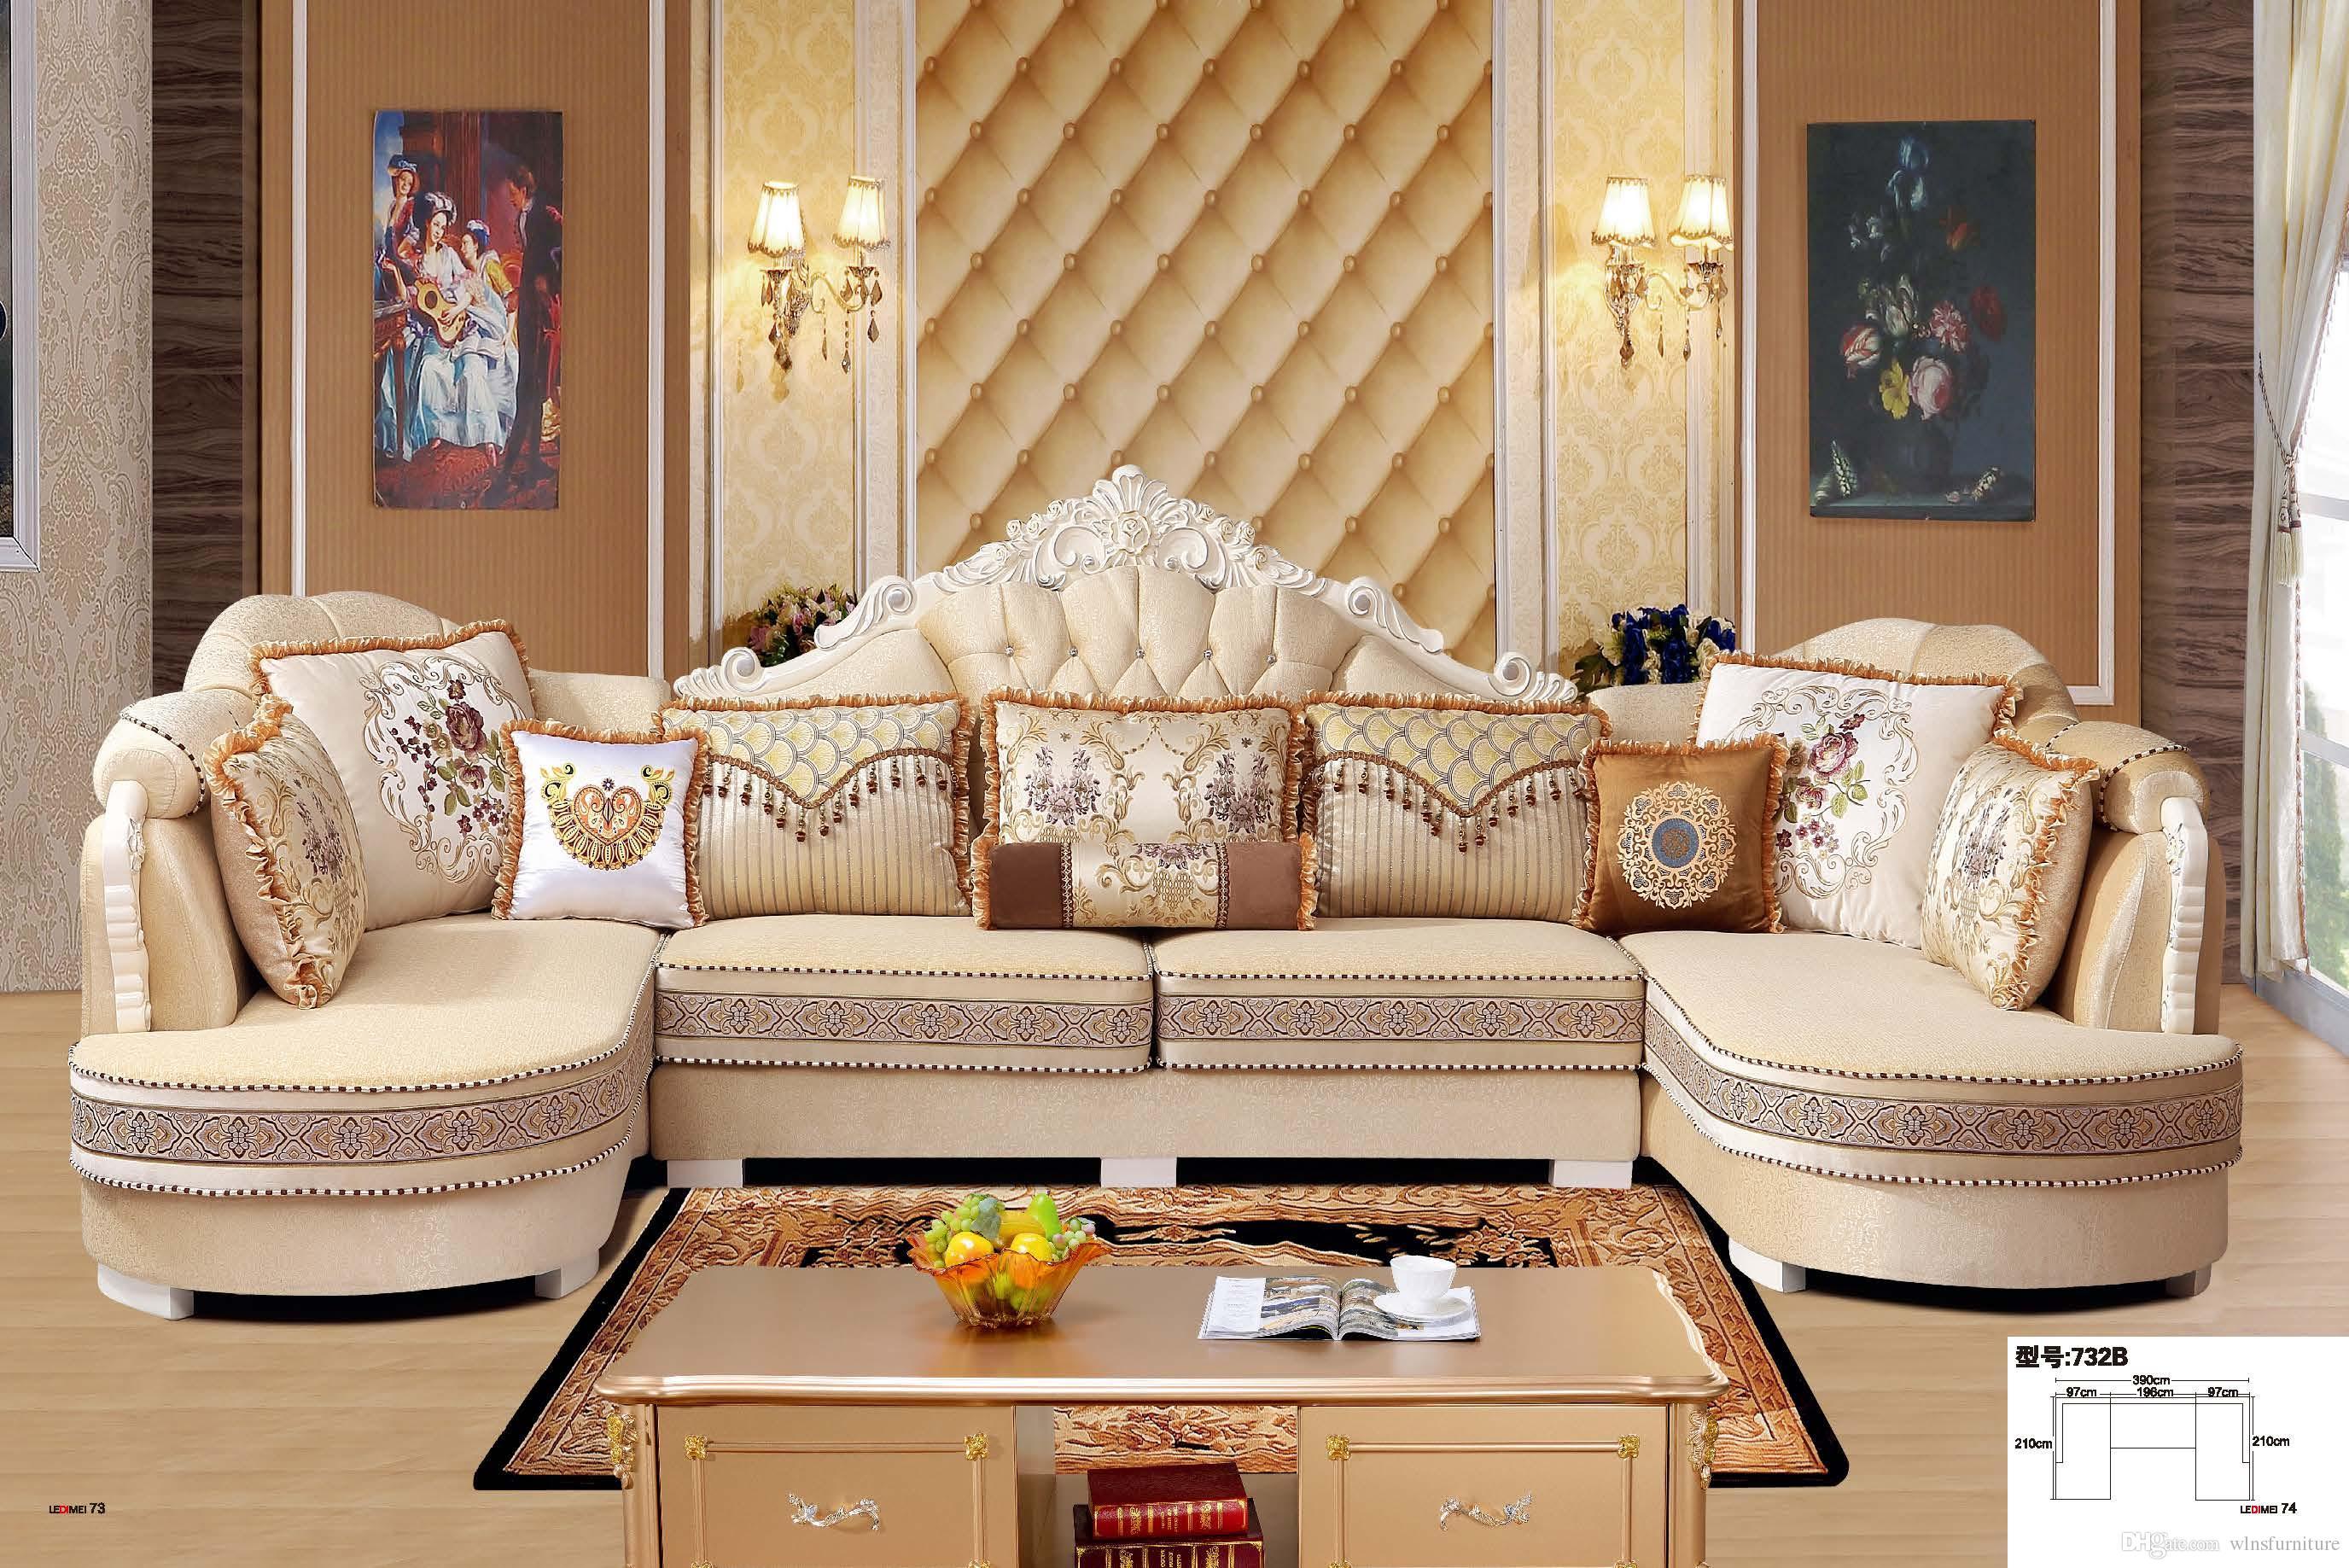 Compre Sofa Moderno De Tela De La Sala De Estar En Forma De L Sofa